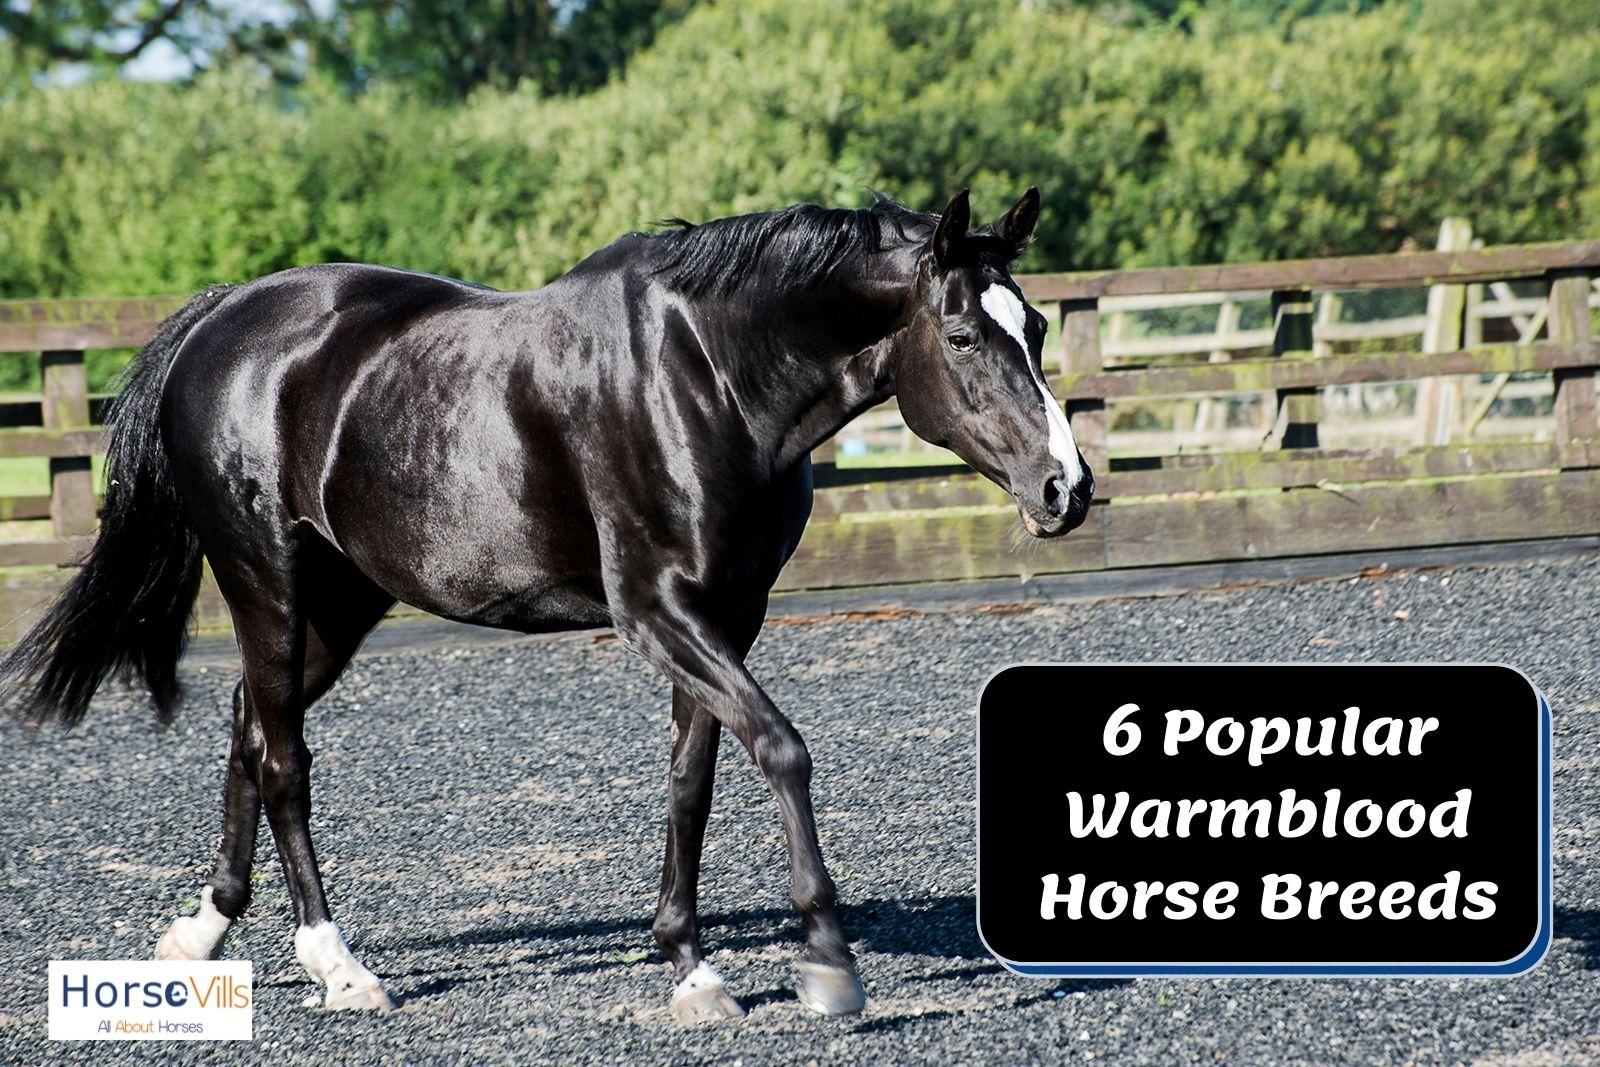 a black warmblood horse with white feet